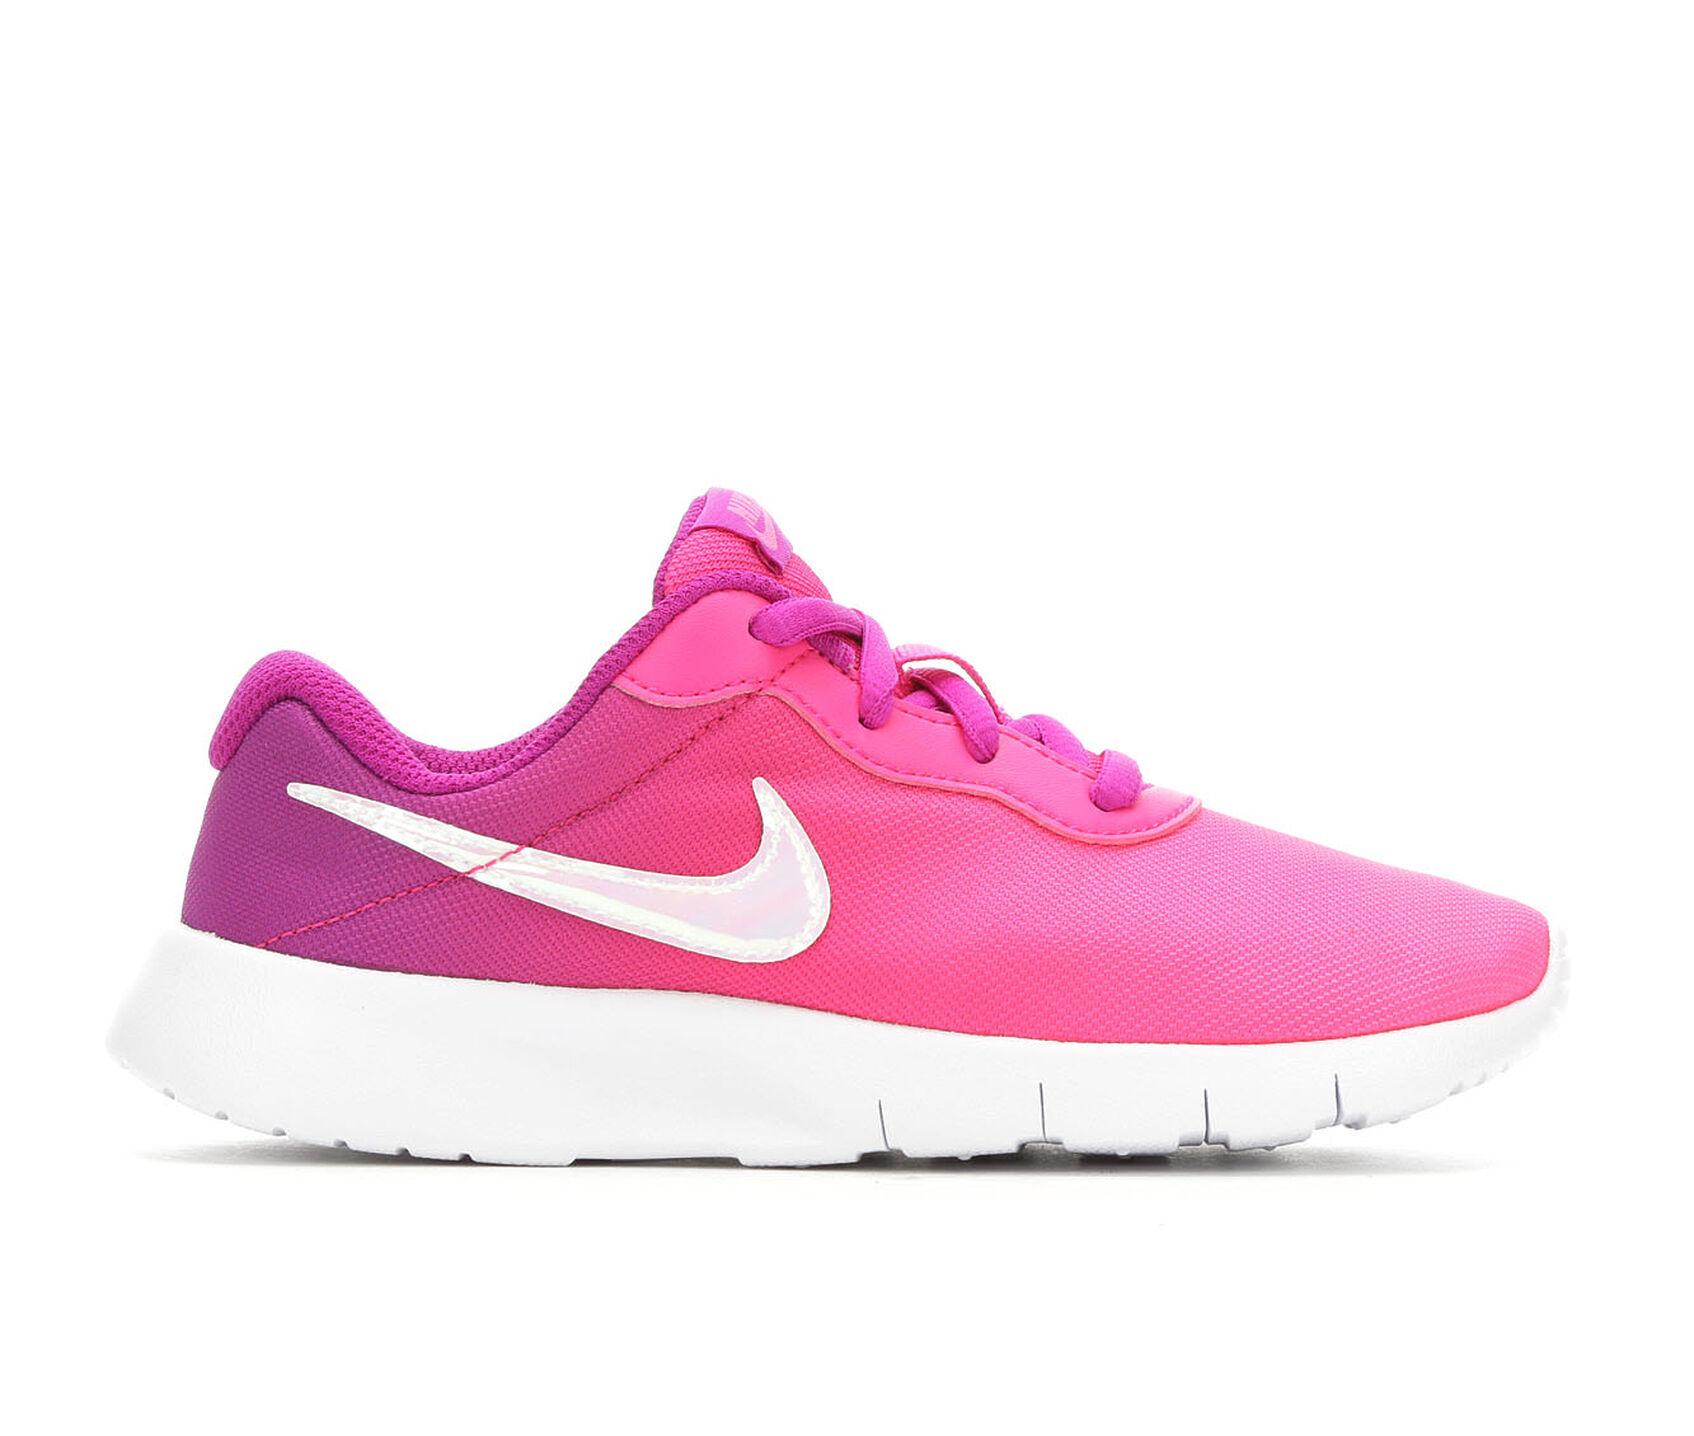 502ba937b6e Girls  Nike Little Kid Tanjun Fade Running Shoes